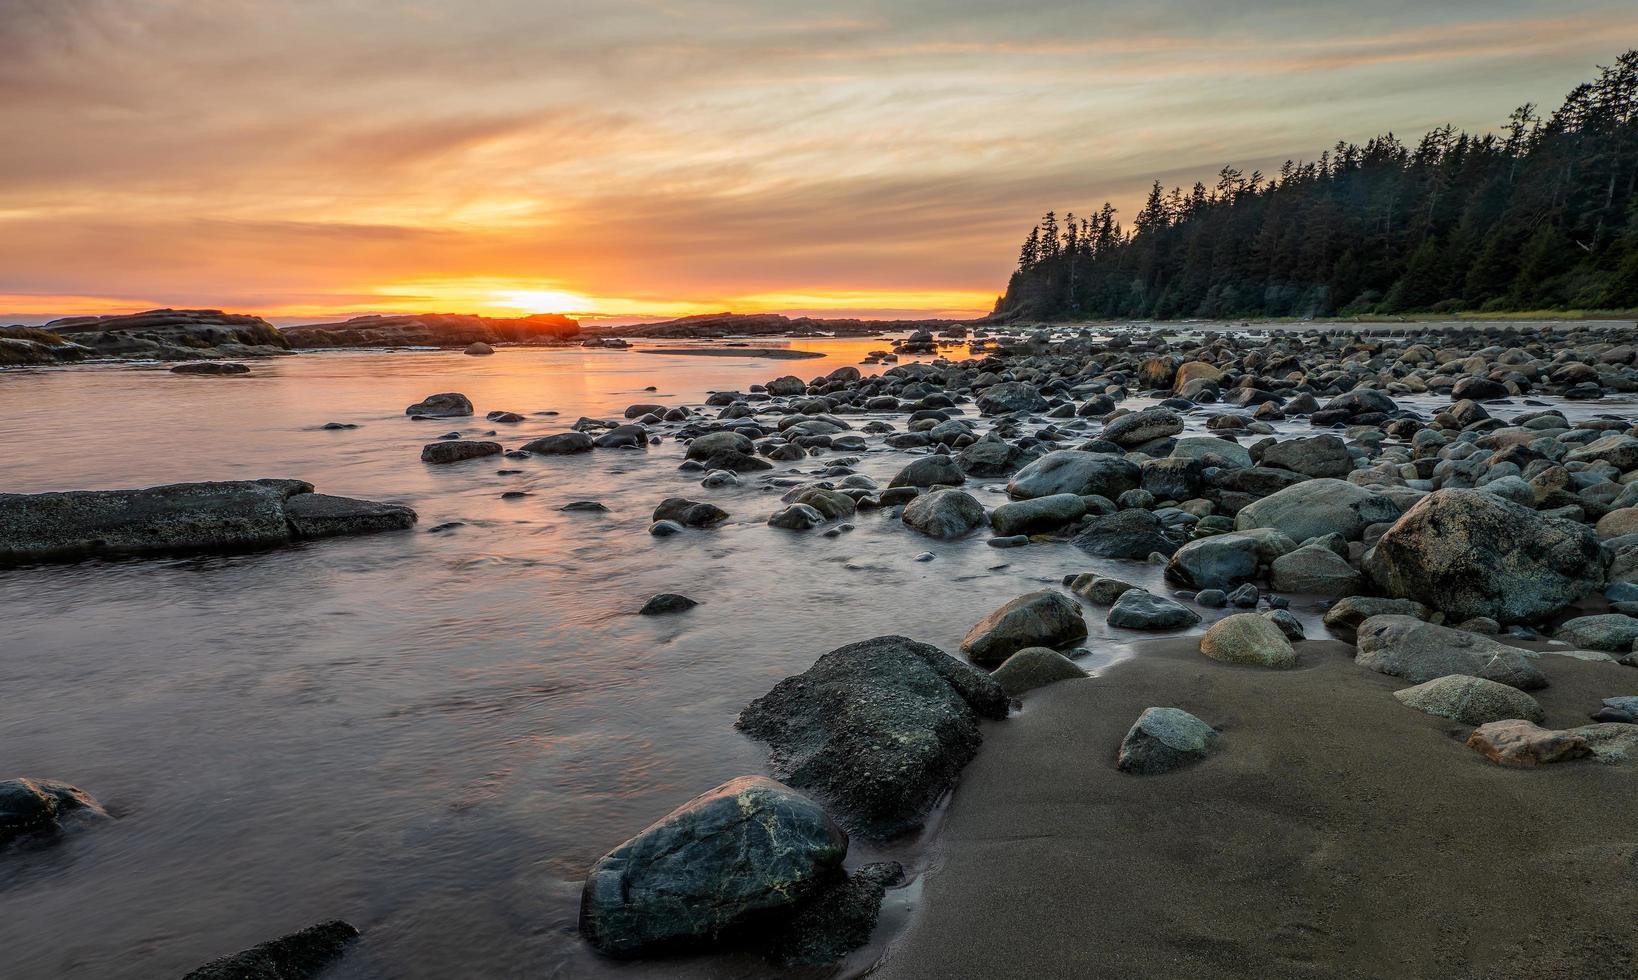 felsiges Ufer während des Sonnenuntergangs foto